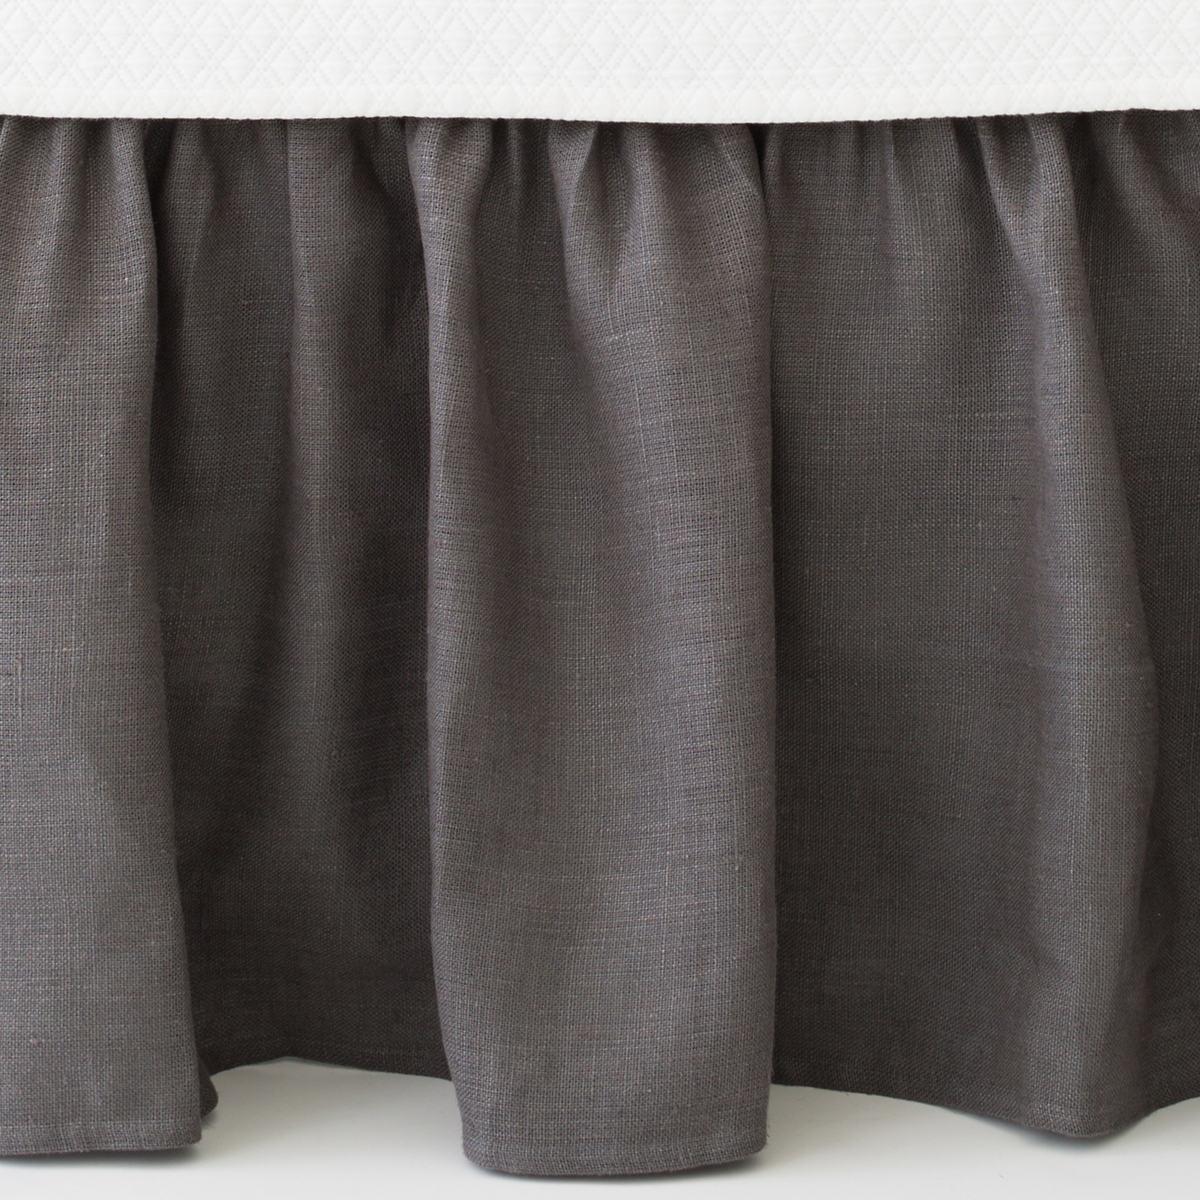 Stone Washed Linen Shale Paneled Bed Skirt